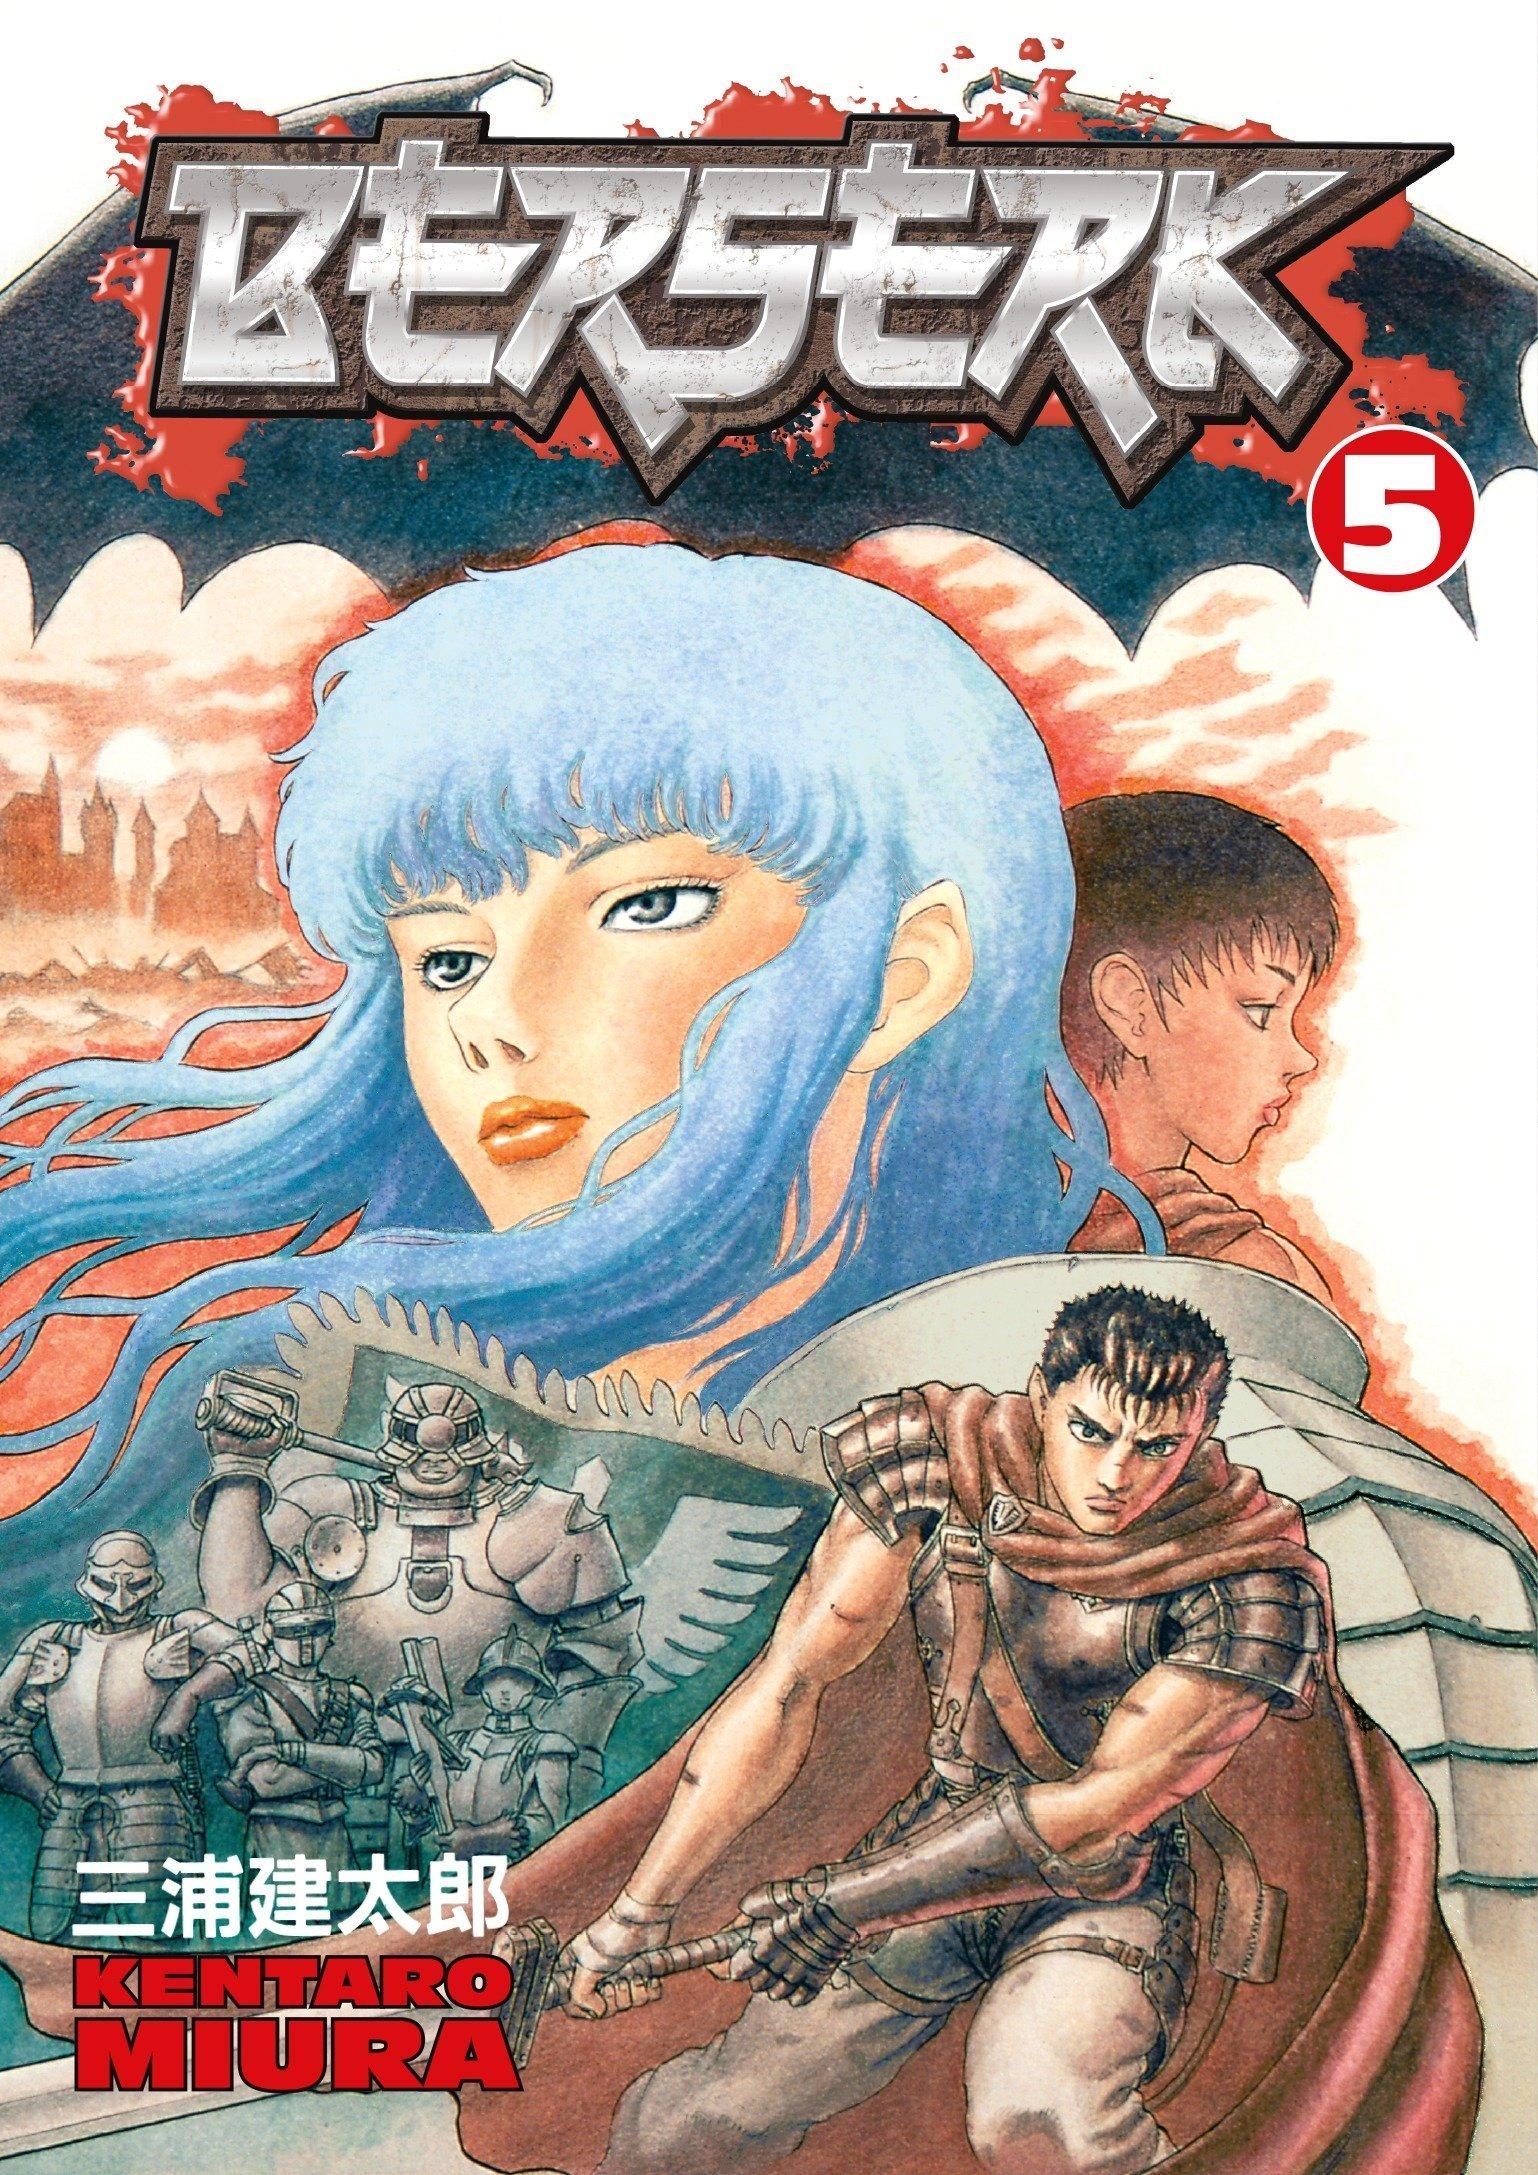 Berserk, Vol. 5: Kentaro Miura, Kentaro Miura: 9781593072513: Amazon.com:  Books